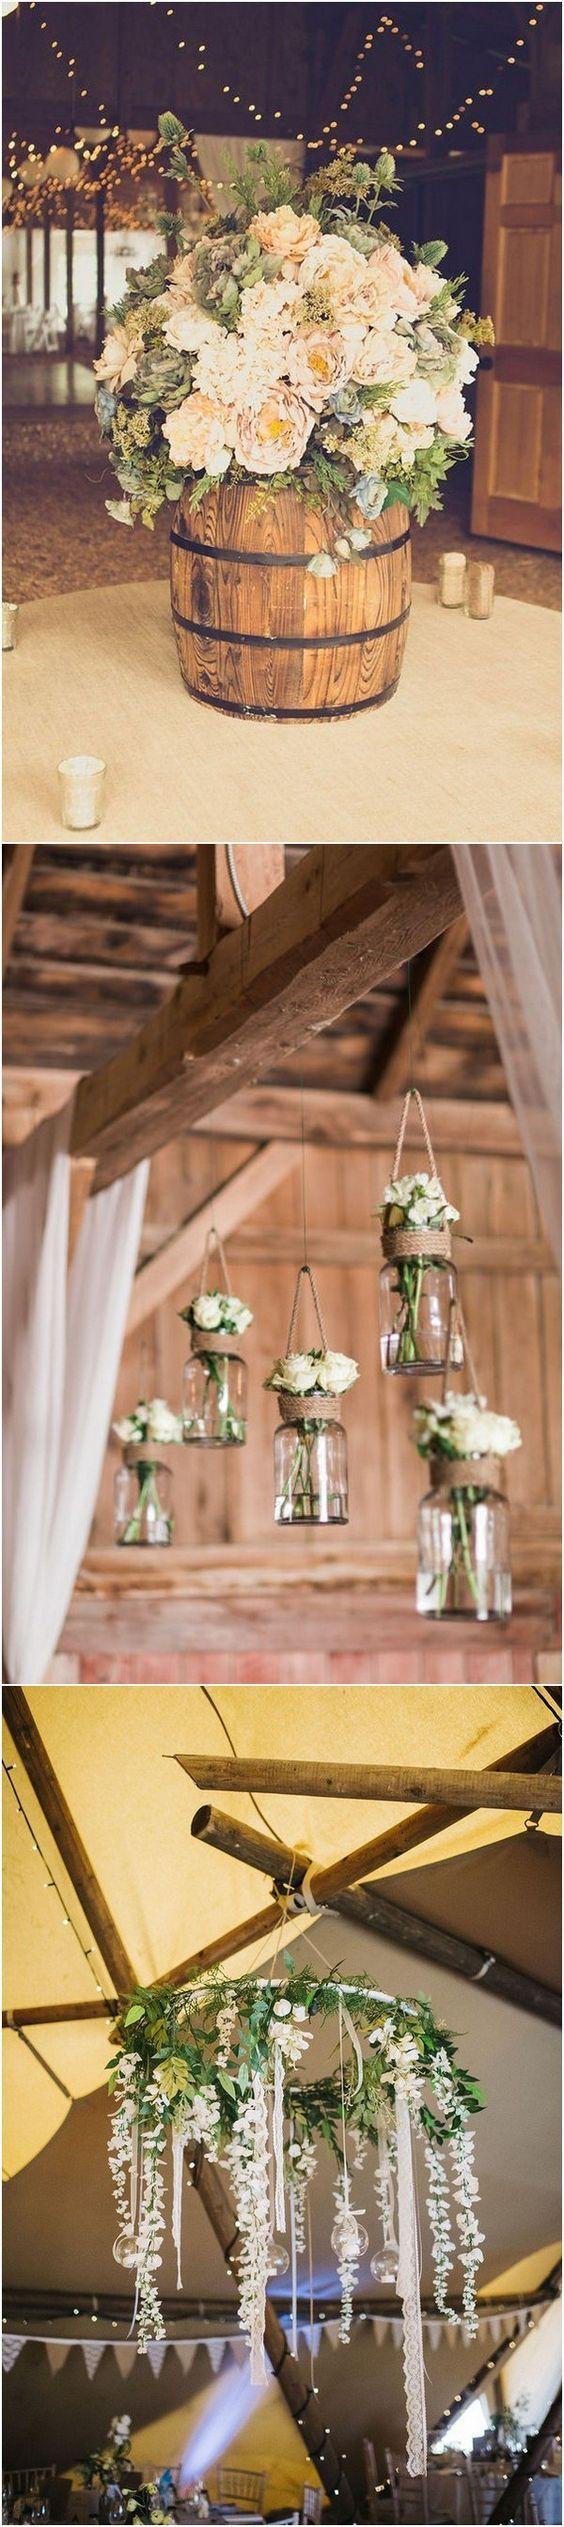 Fall wedding decoration ideas cheap   Perfect Country Rustic Barn Wedding Decoration Ideas  Barn